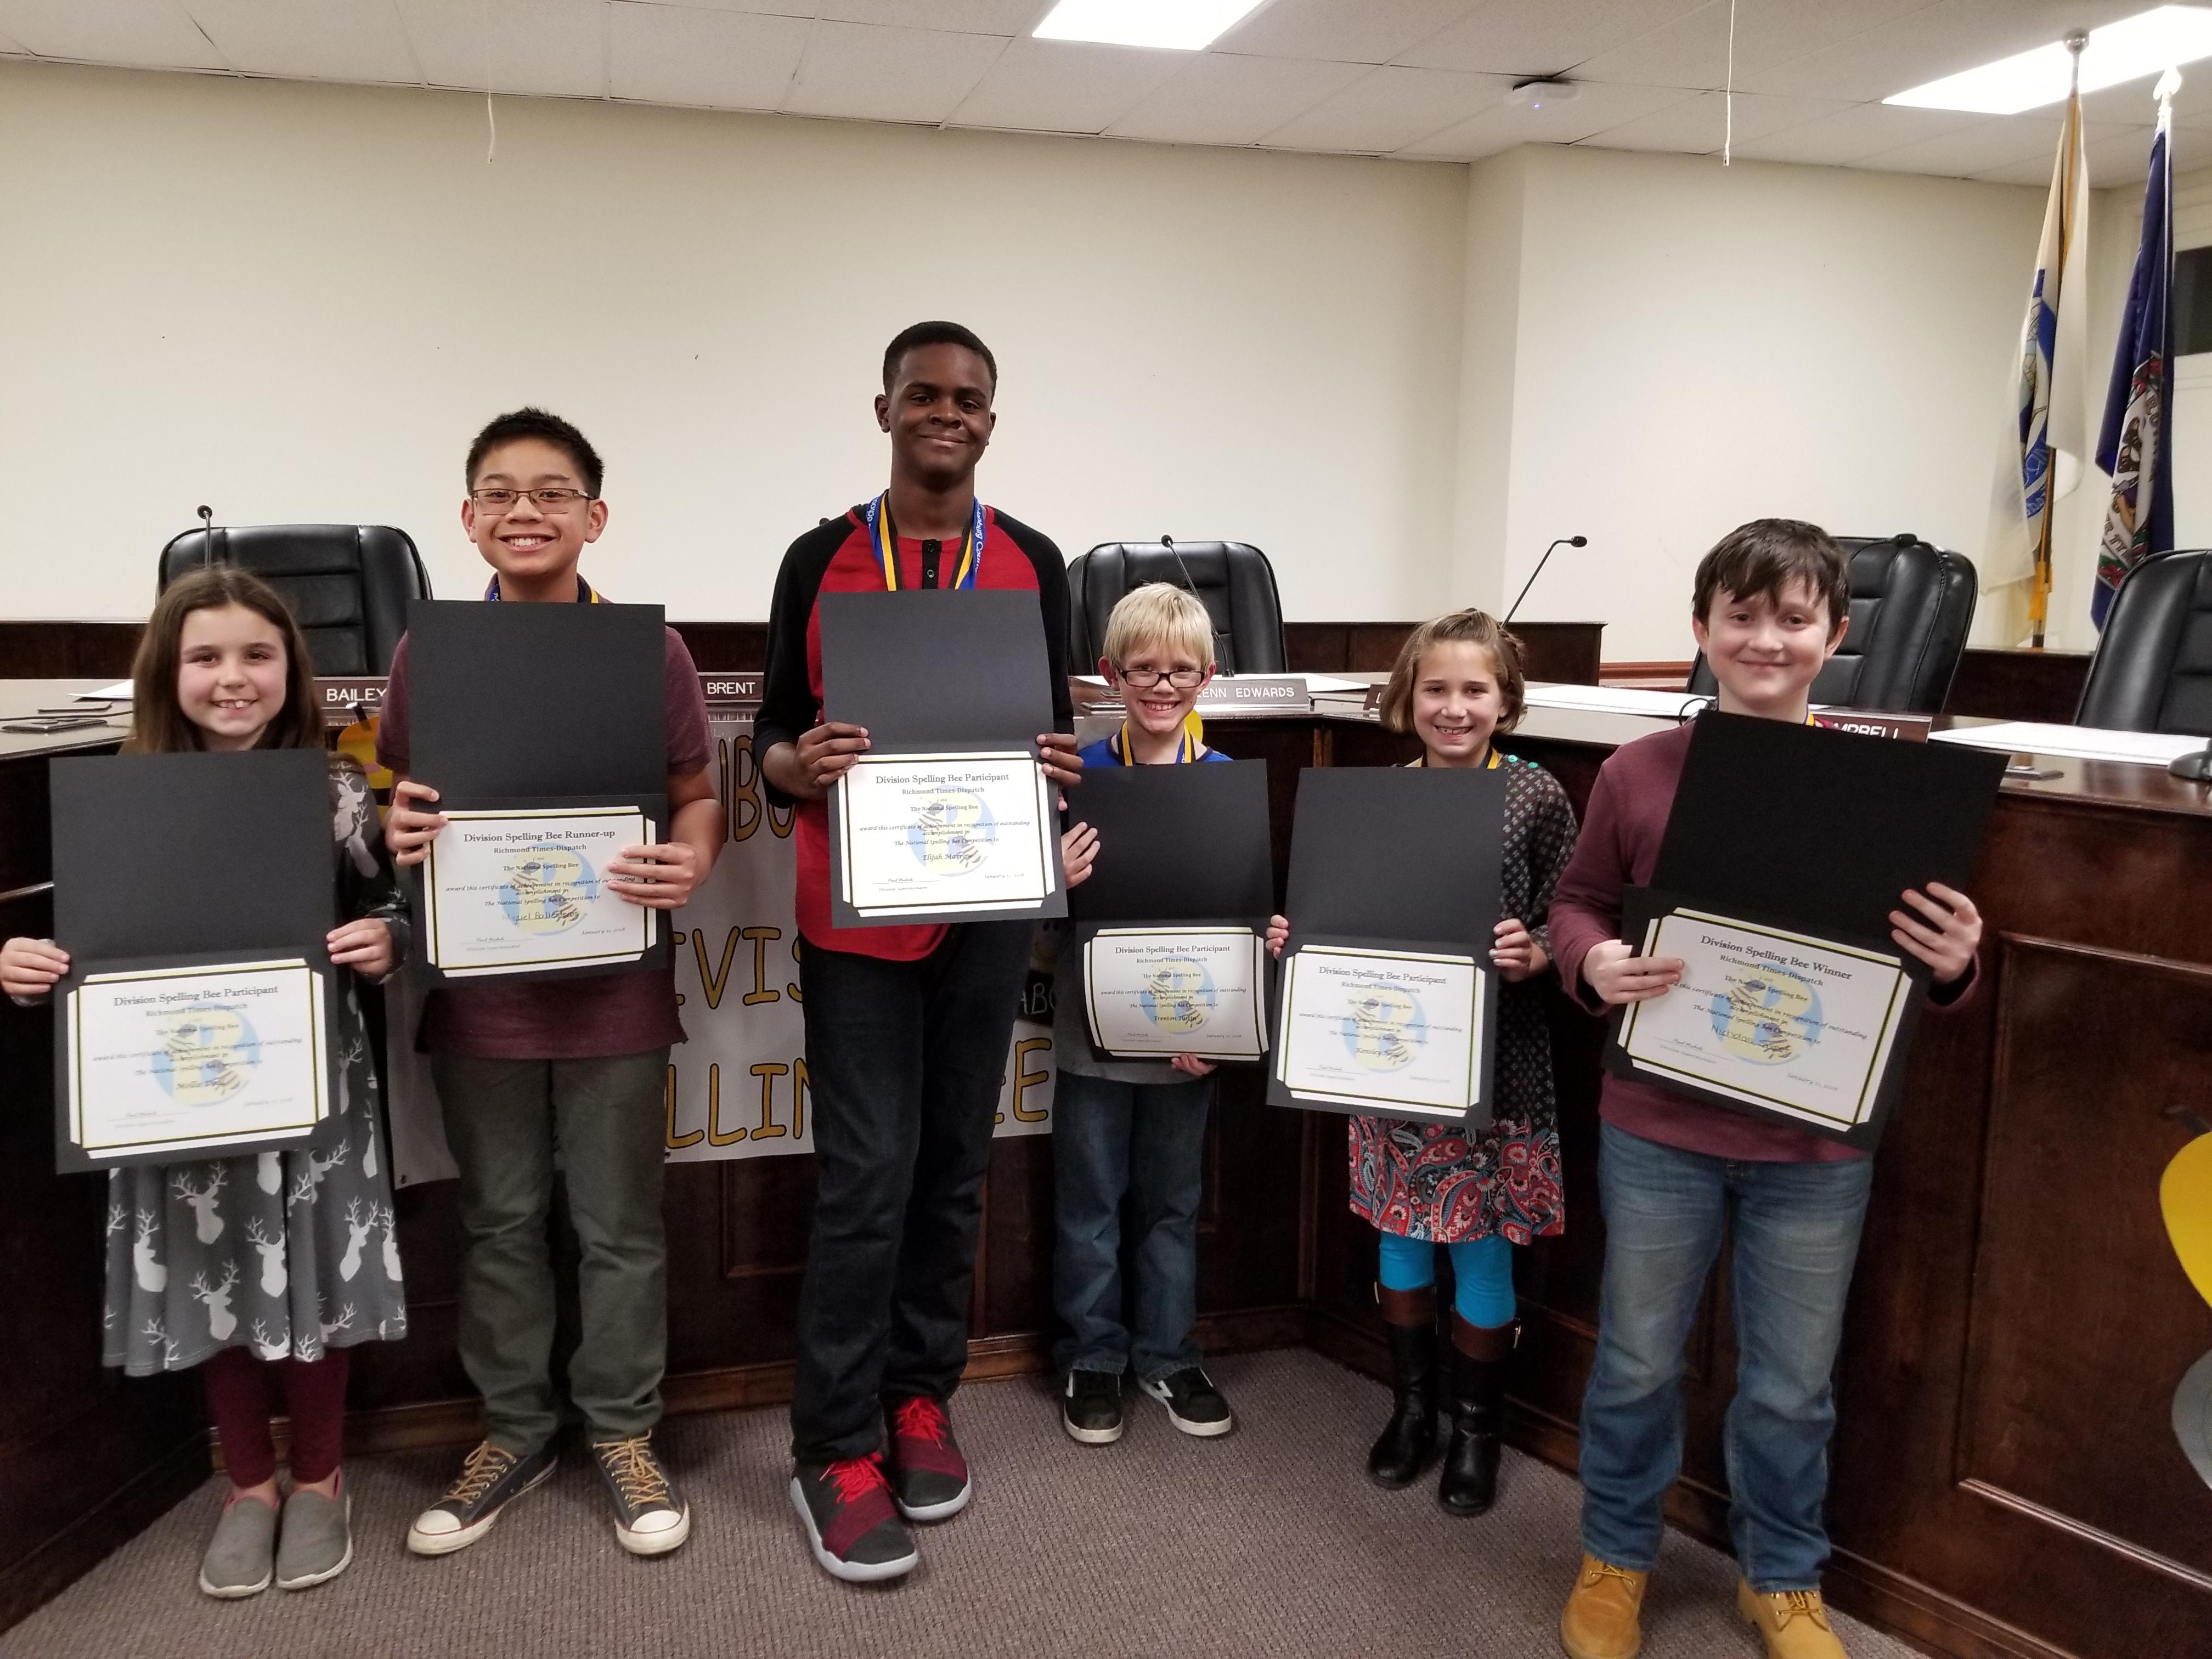 Division Spelling Bee | Mecklenburg County Public Schools